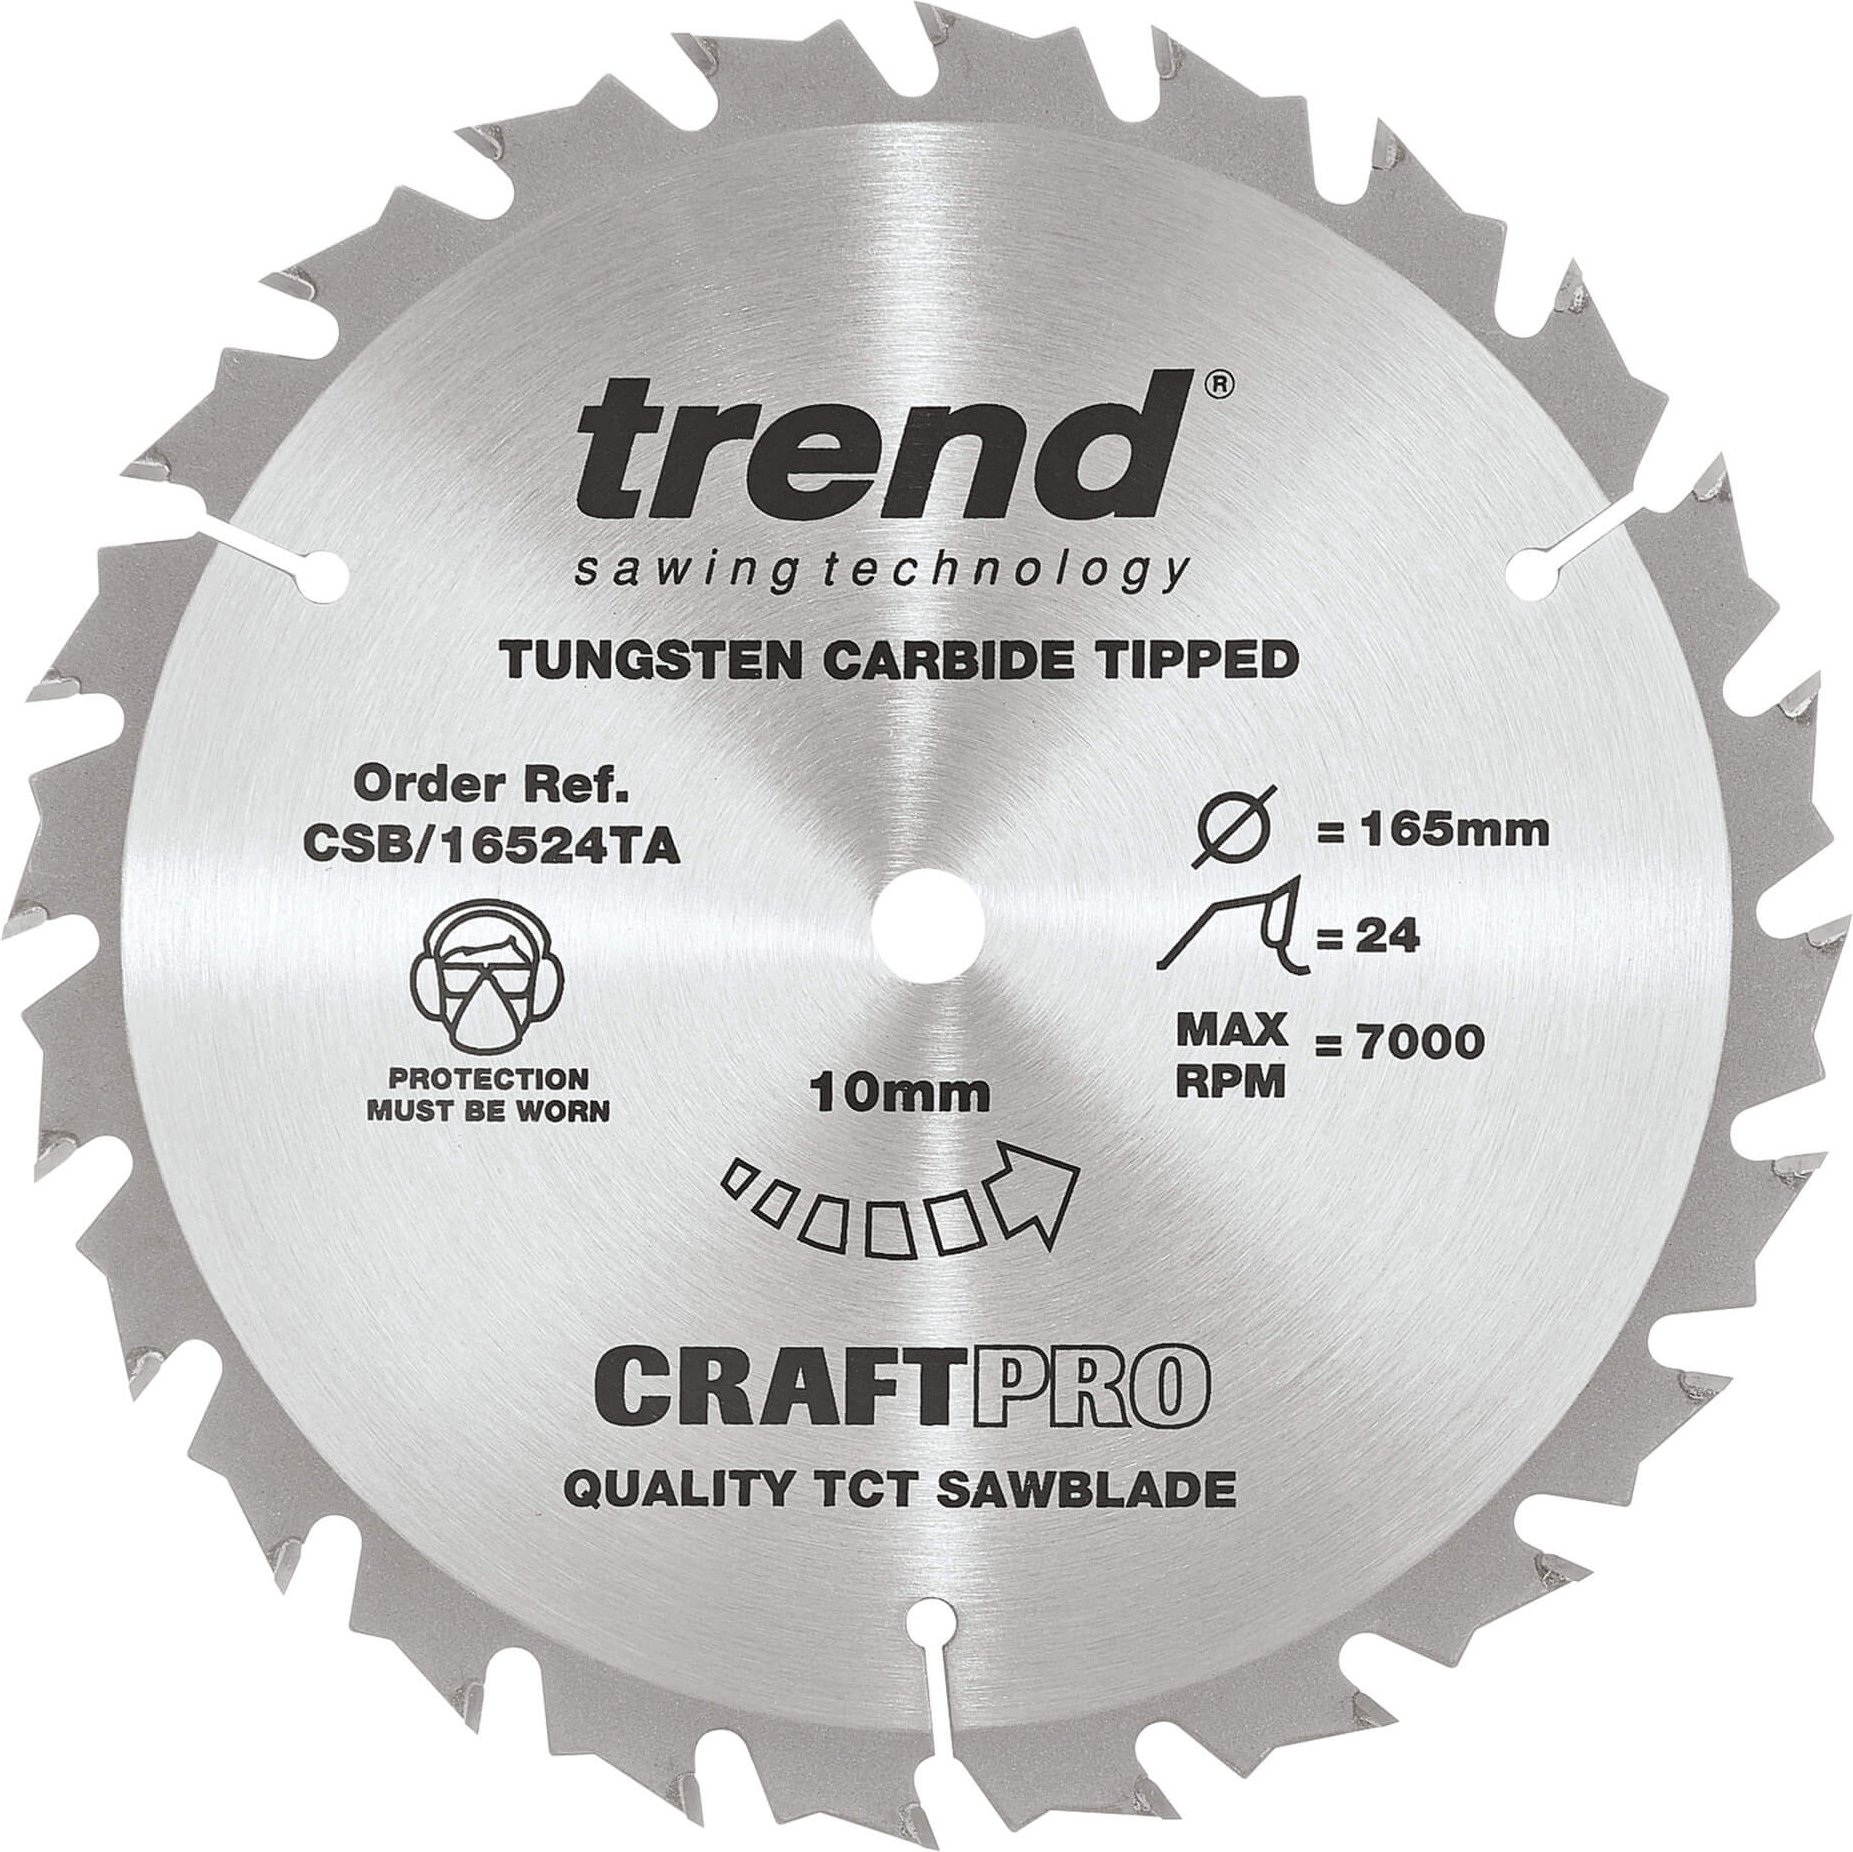 Trend CRAFTPRO Wood Cutting Cordless Saw Blade 165mm 24T 10mm